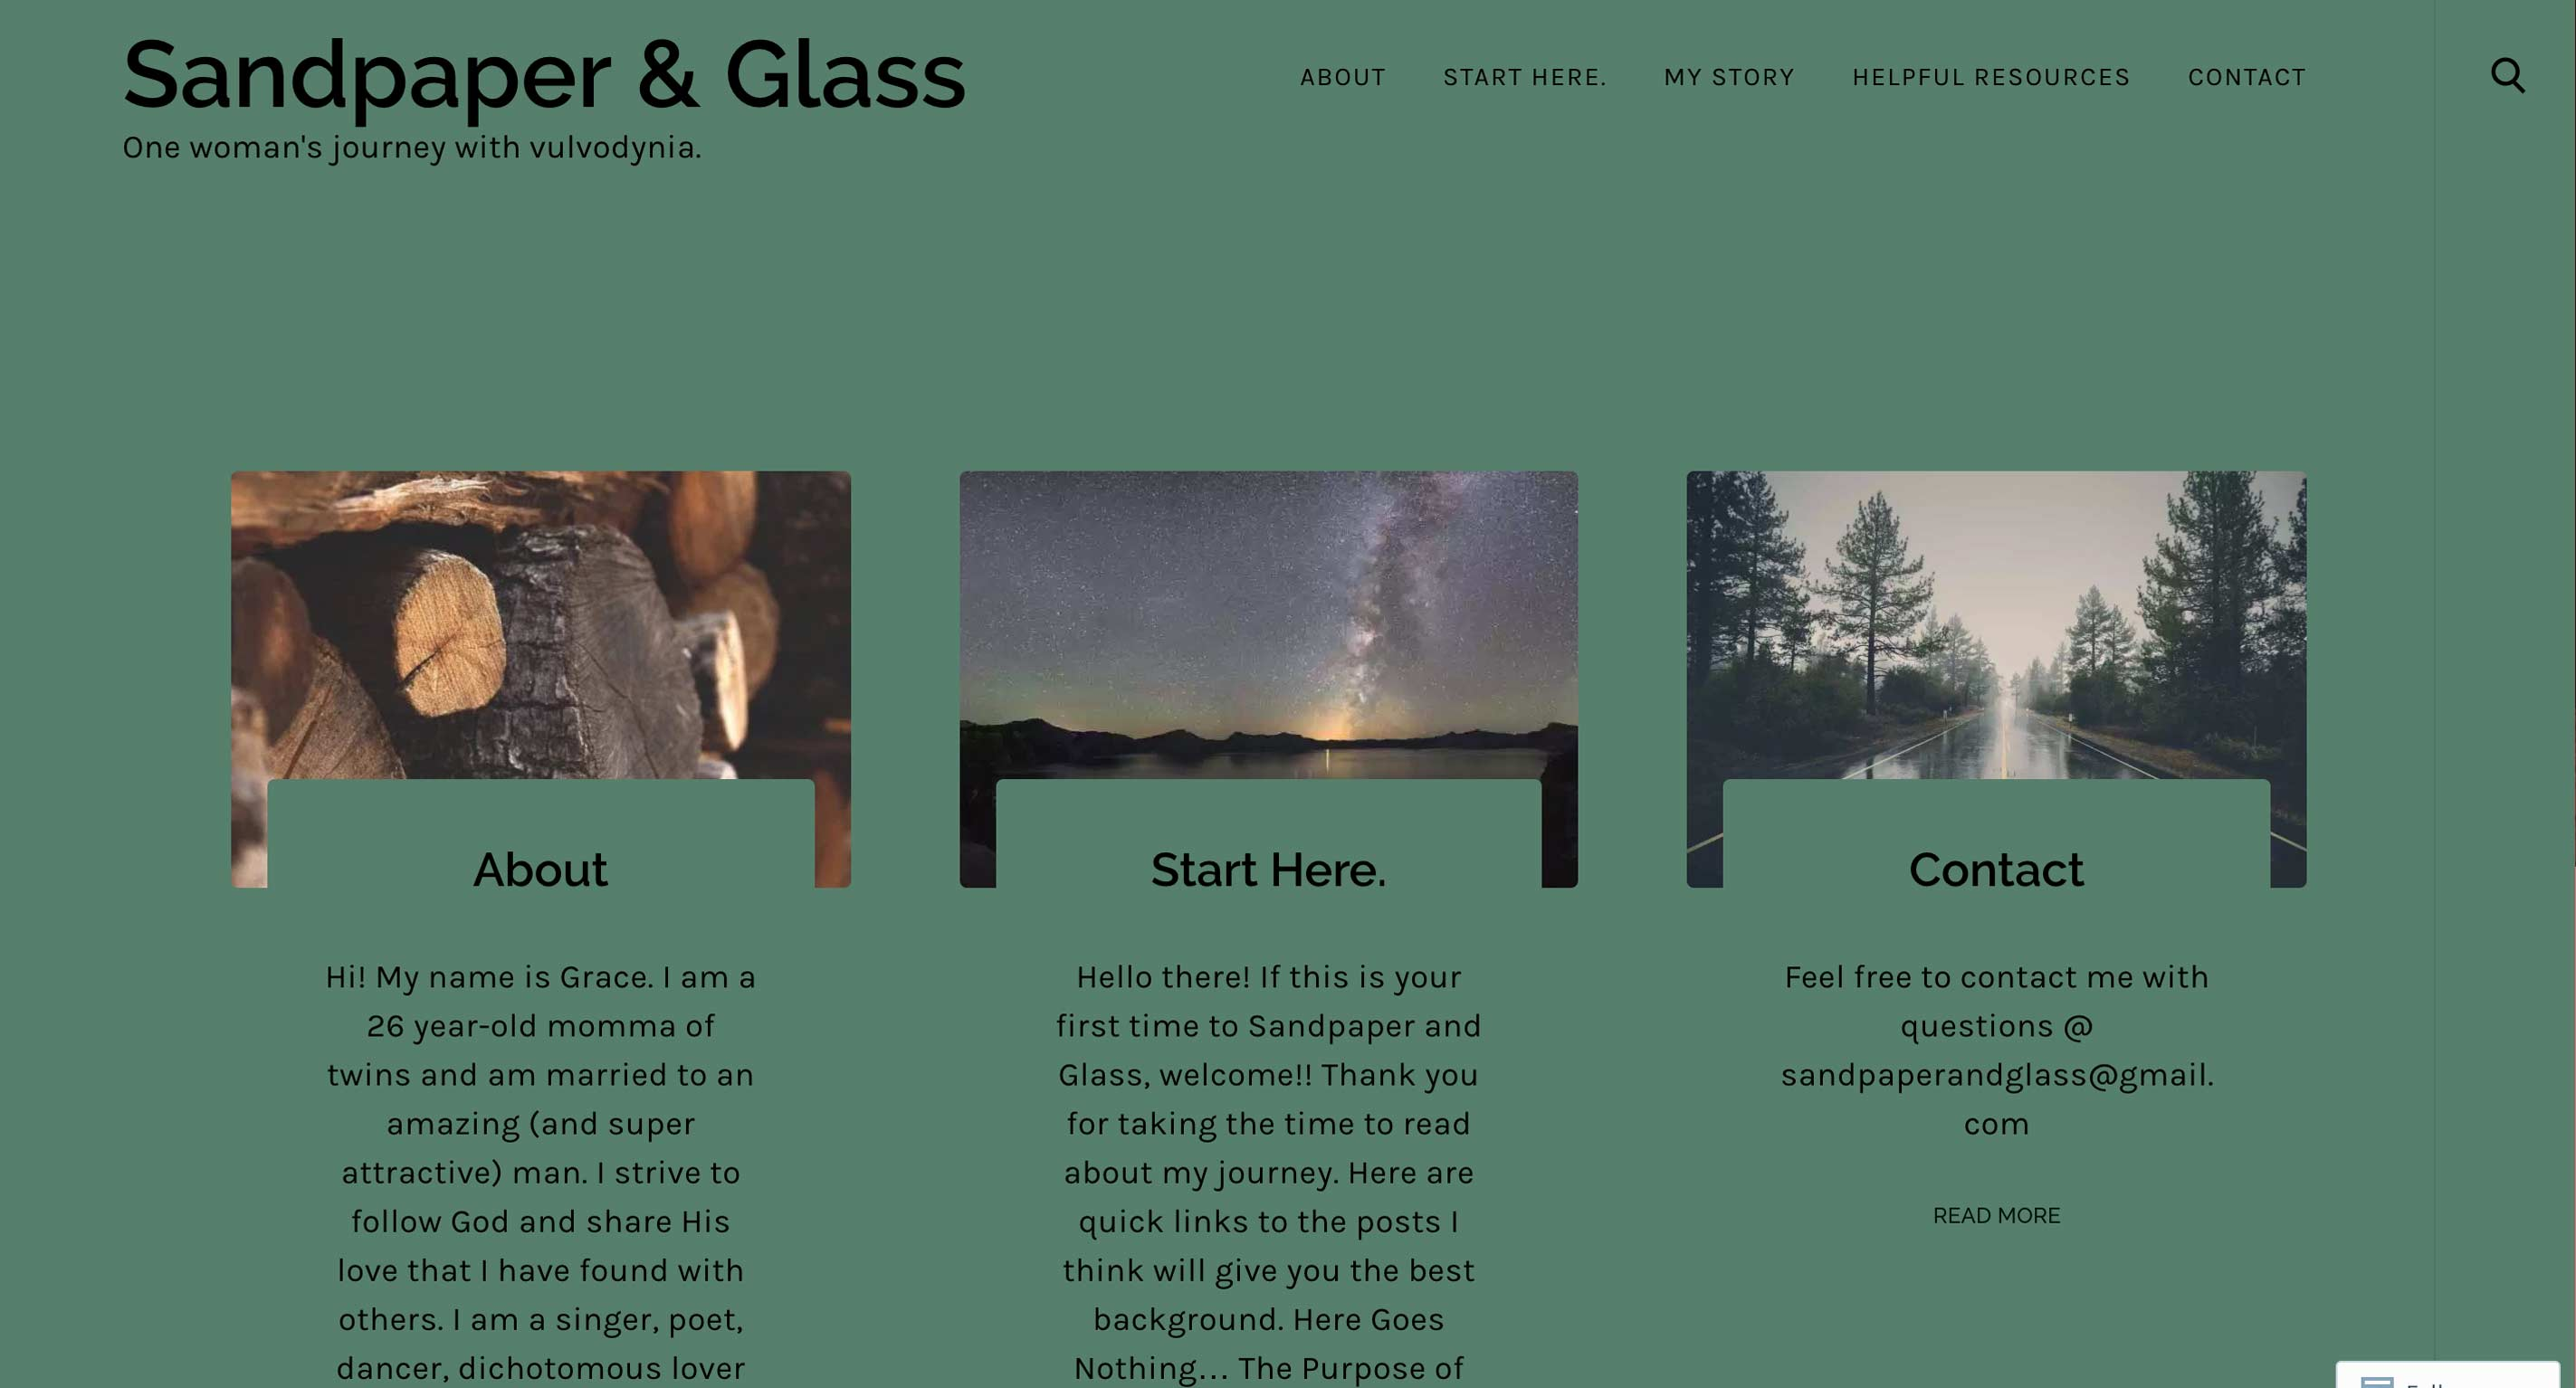 Sandpaper & Glass, One Woman's Journey With Vulvodynia